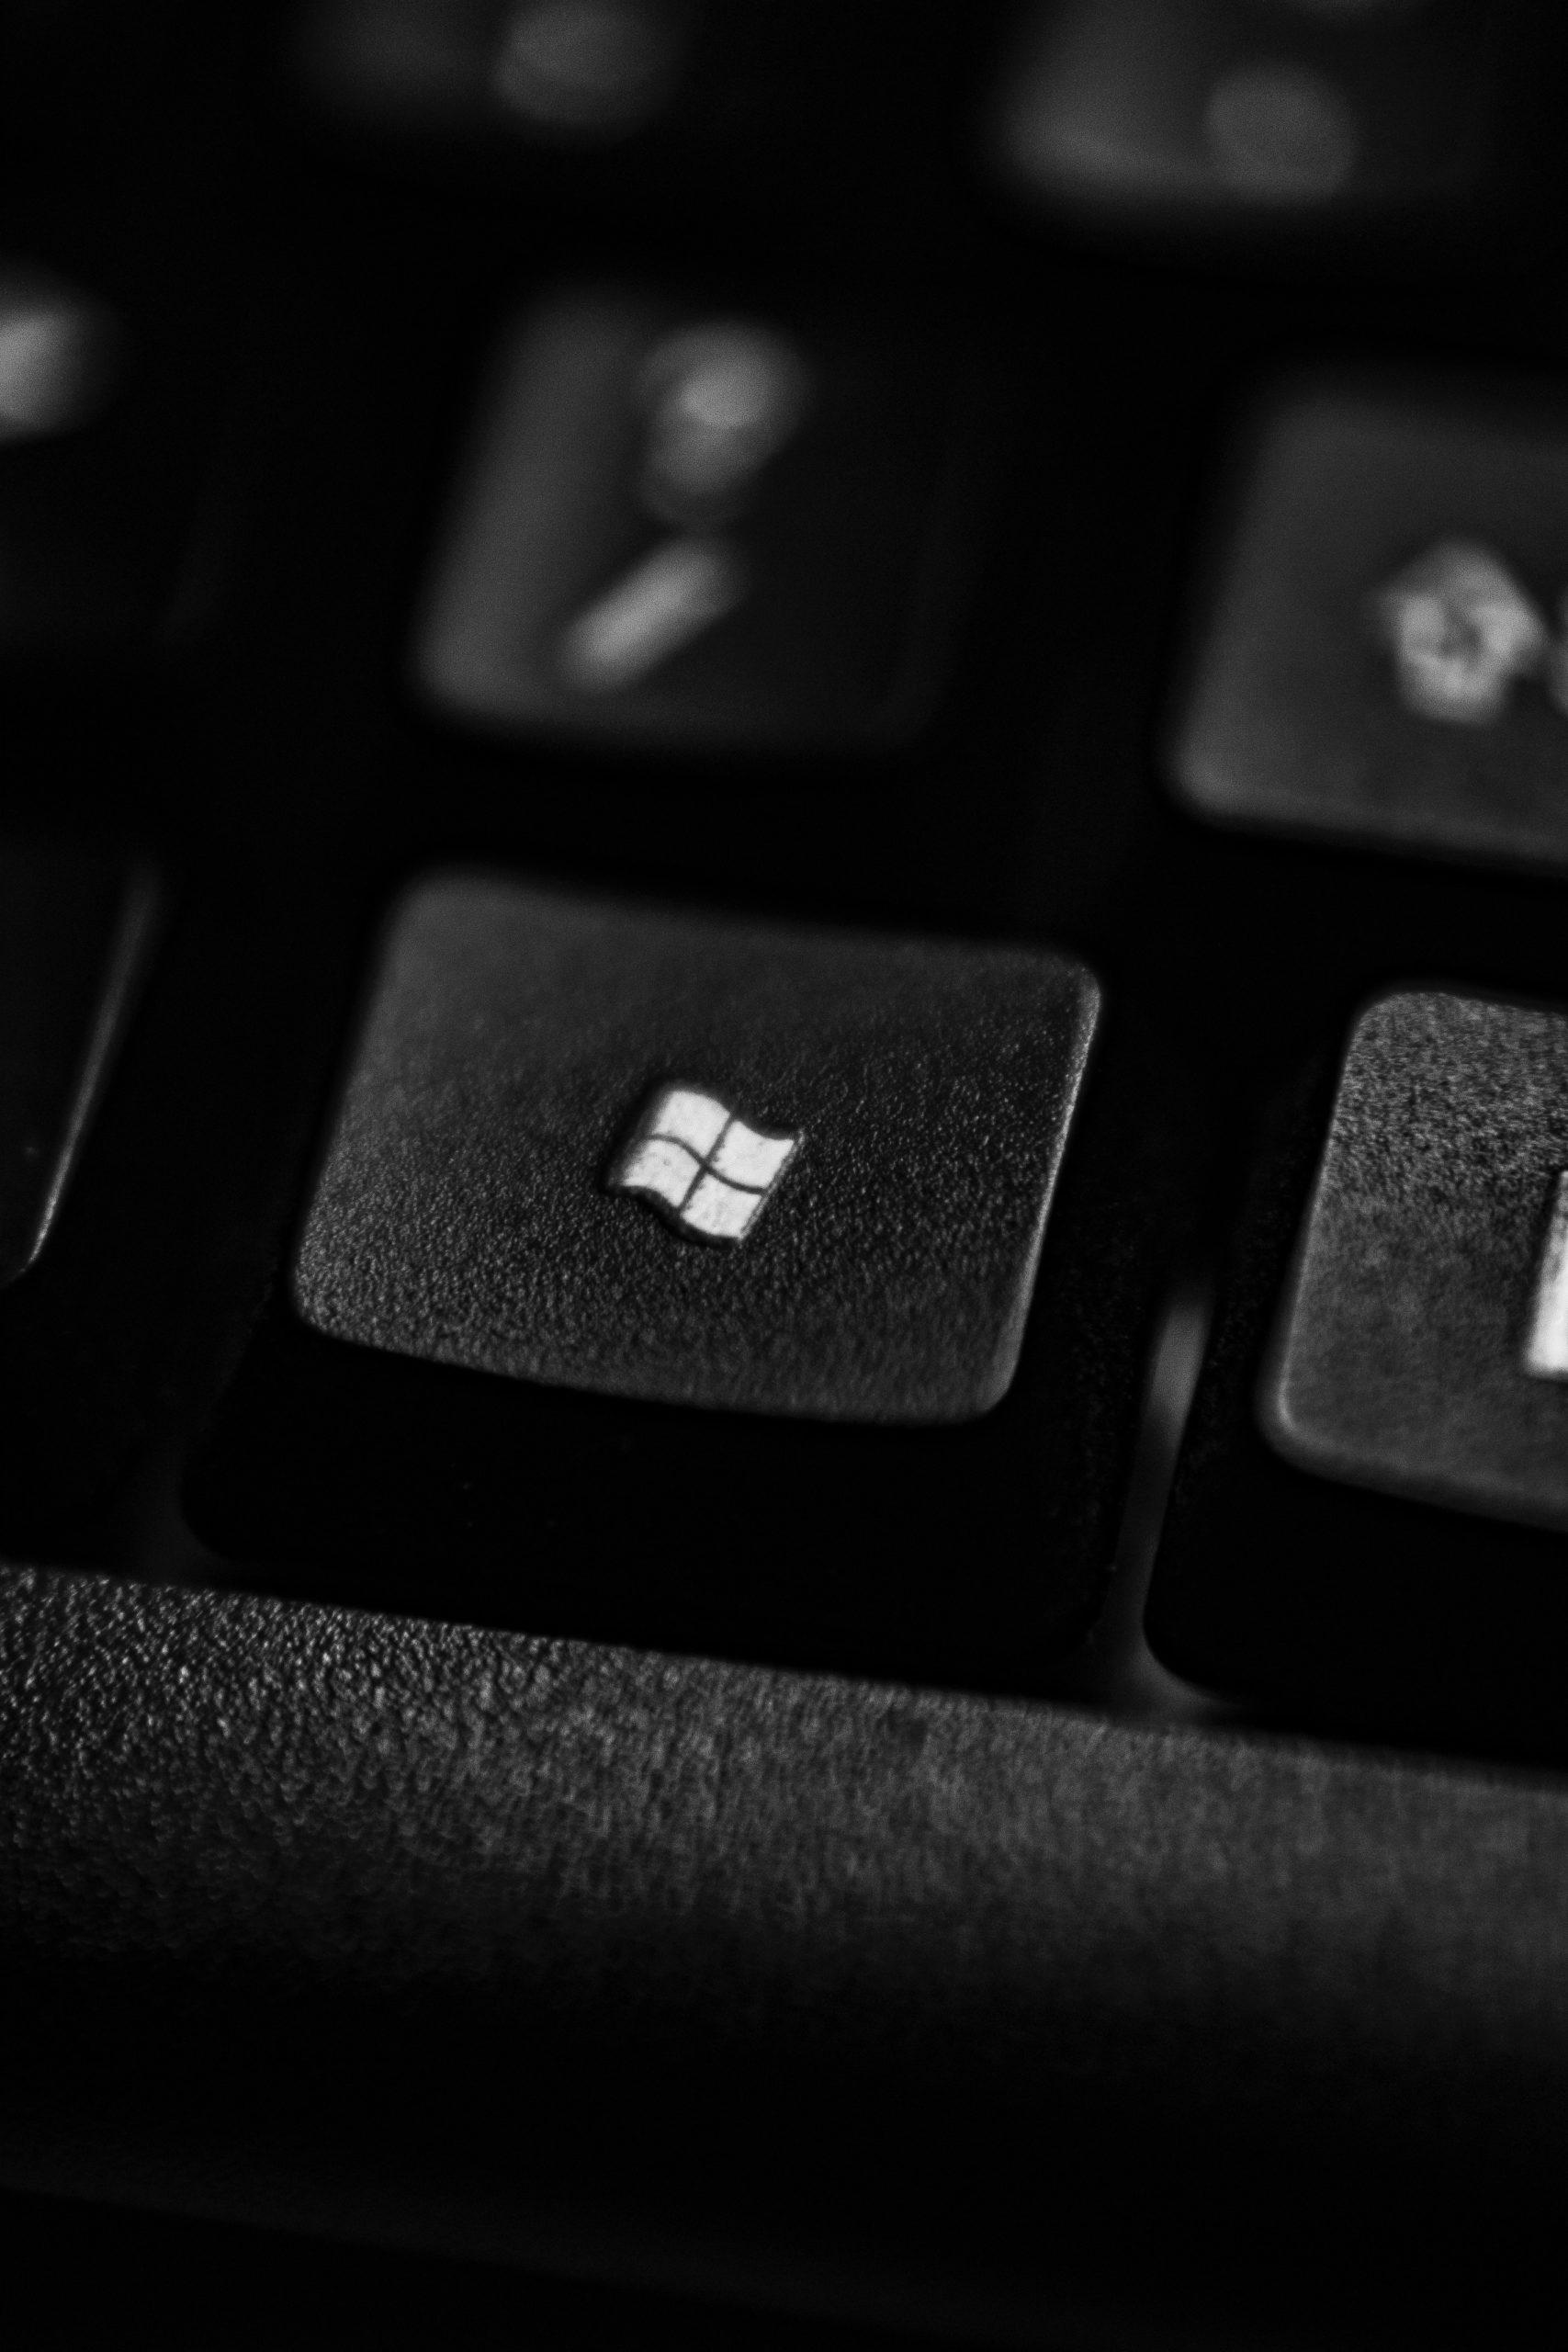 Windows 7 : Office ne s'active plus